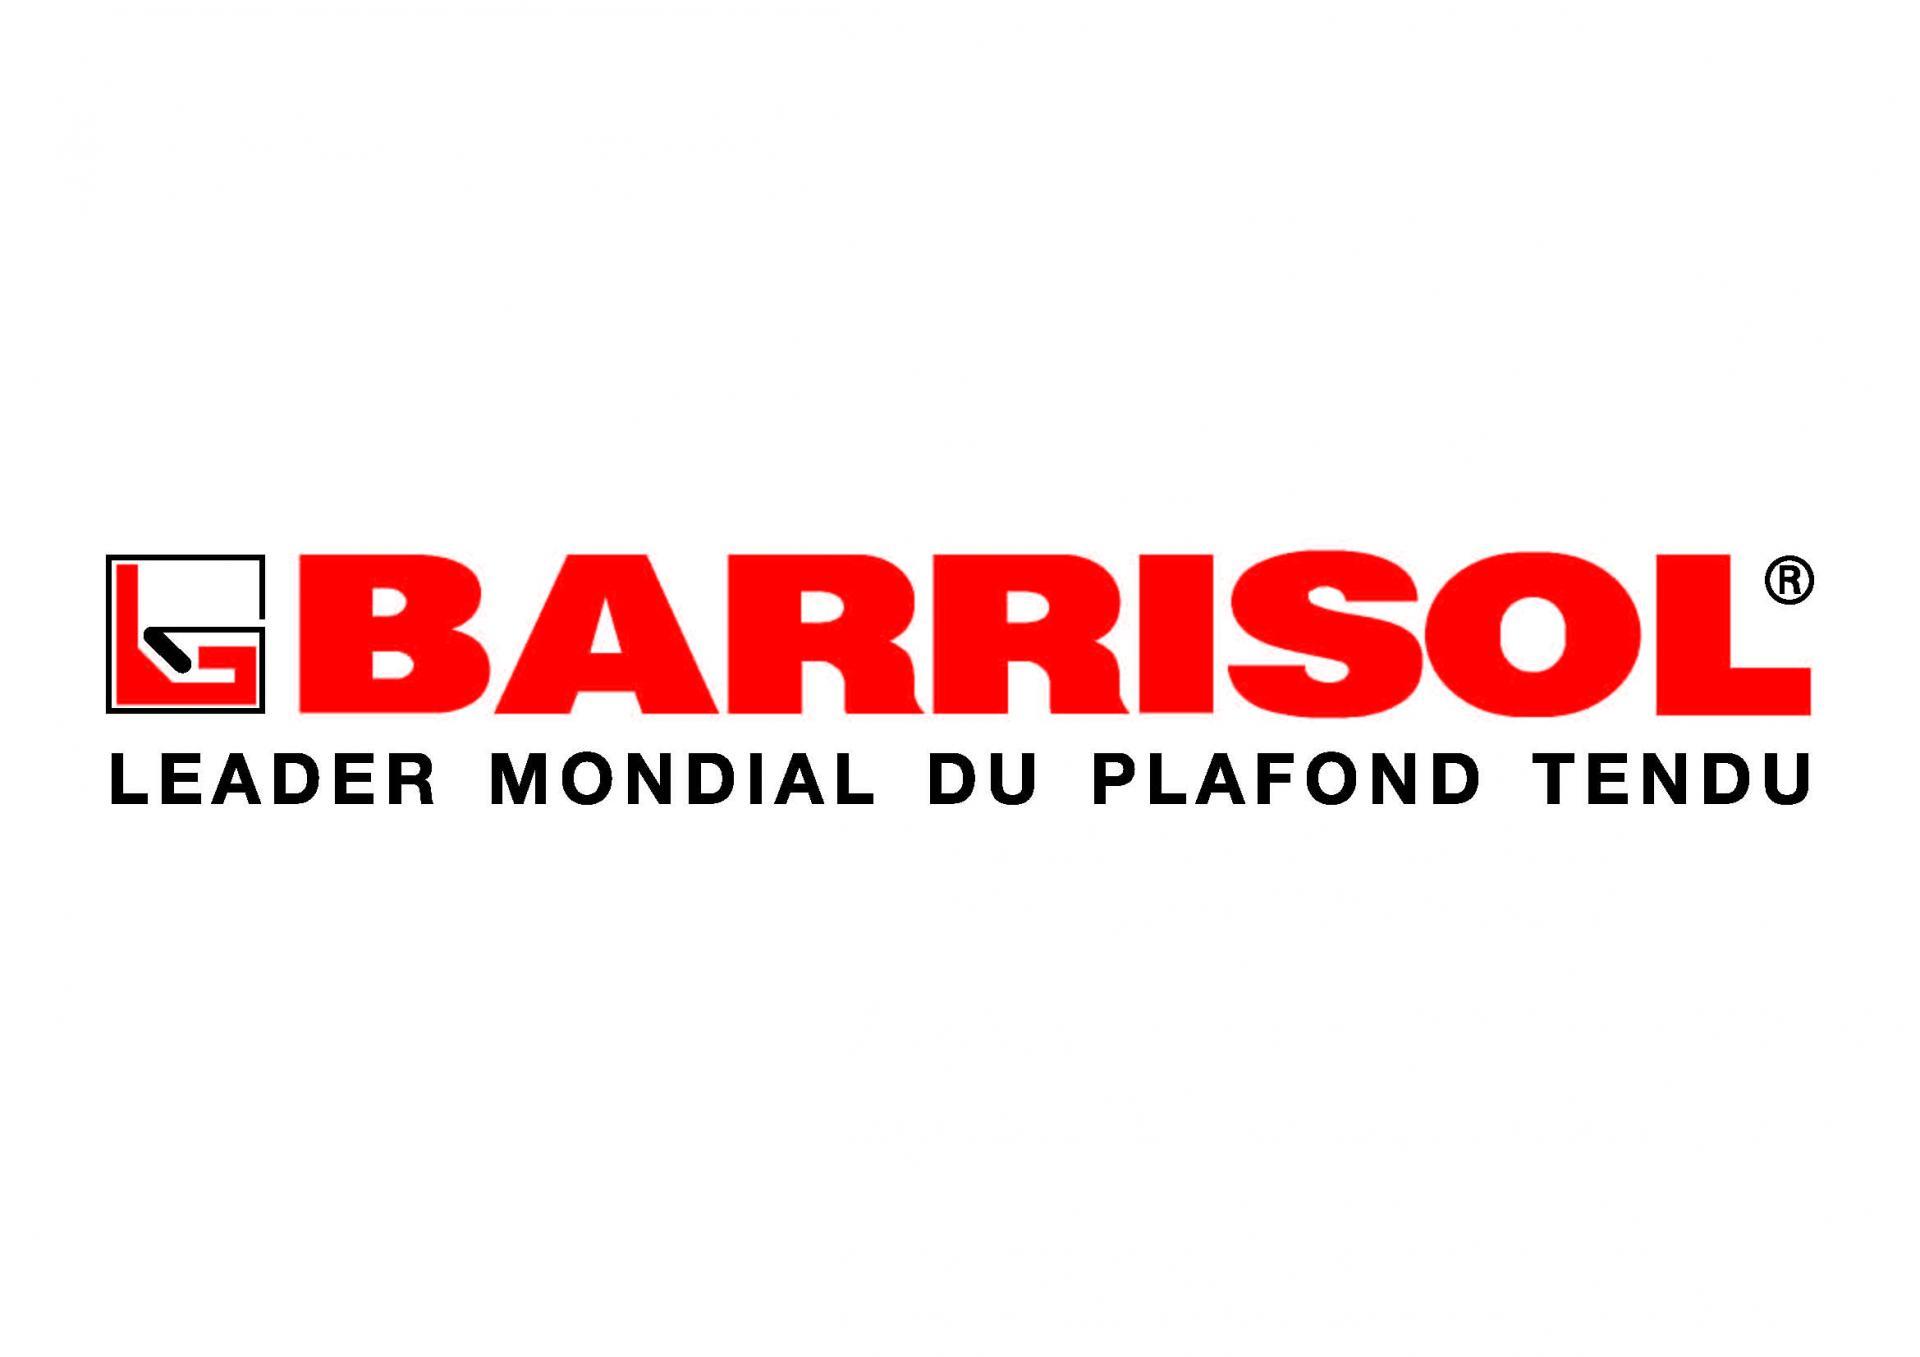 BARRISOL